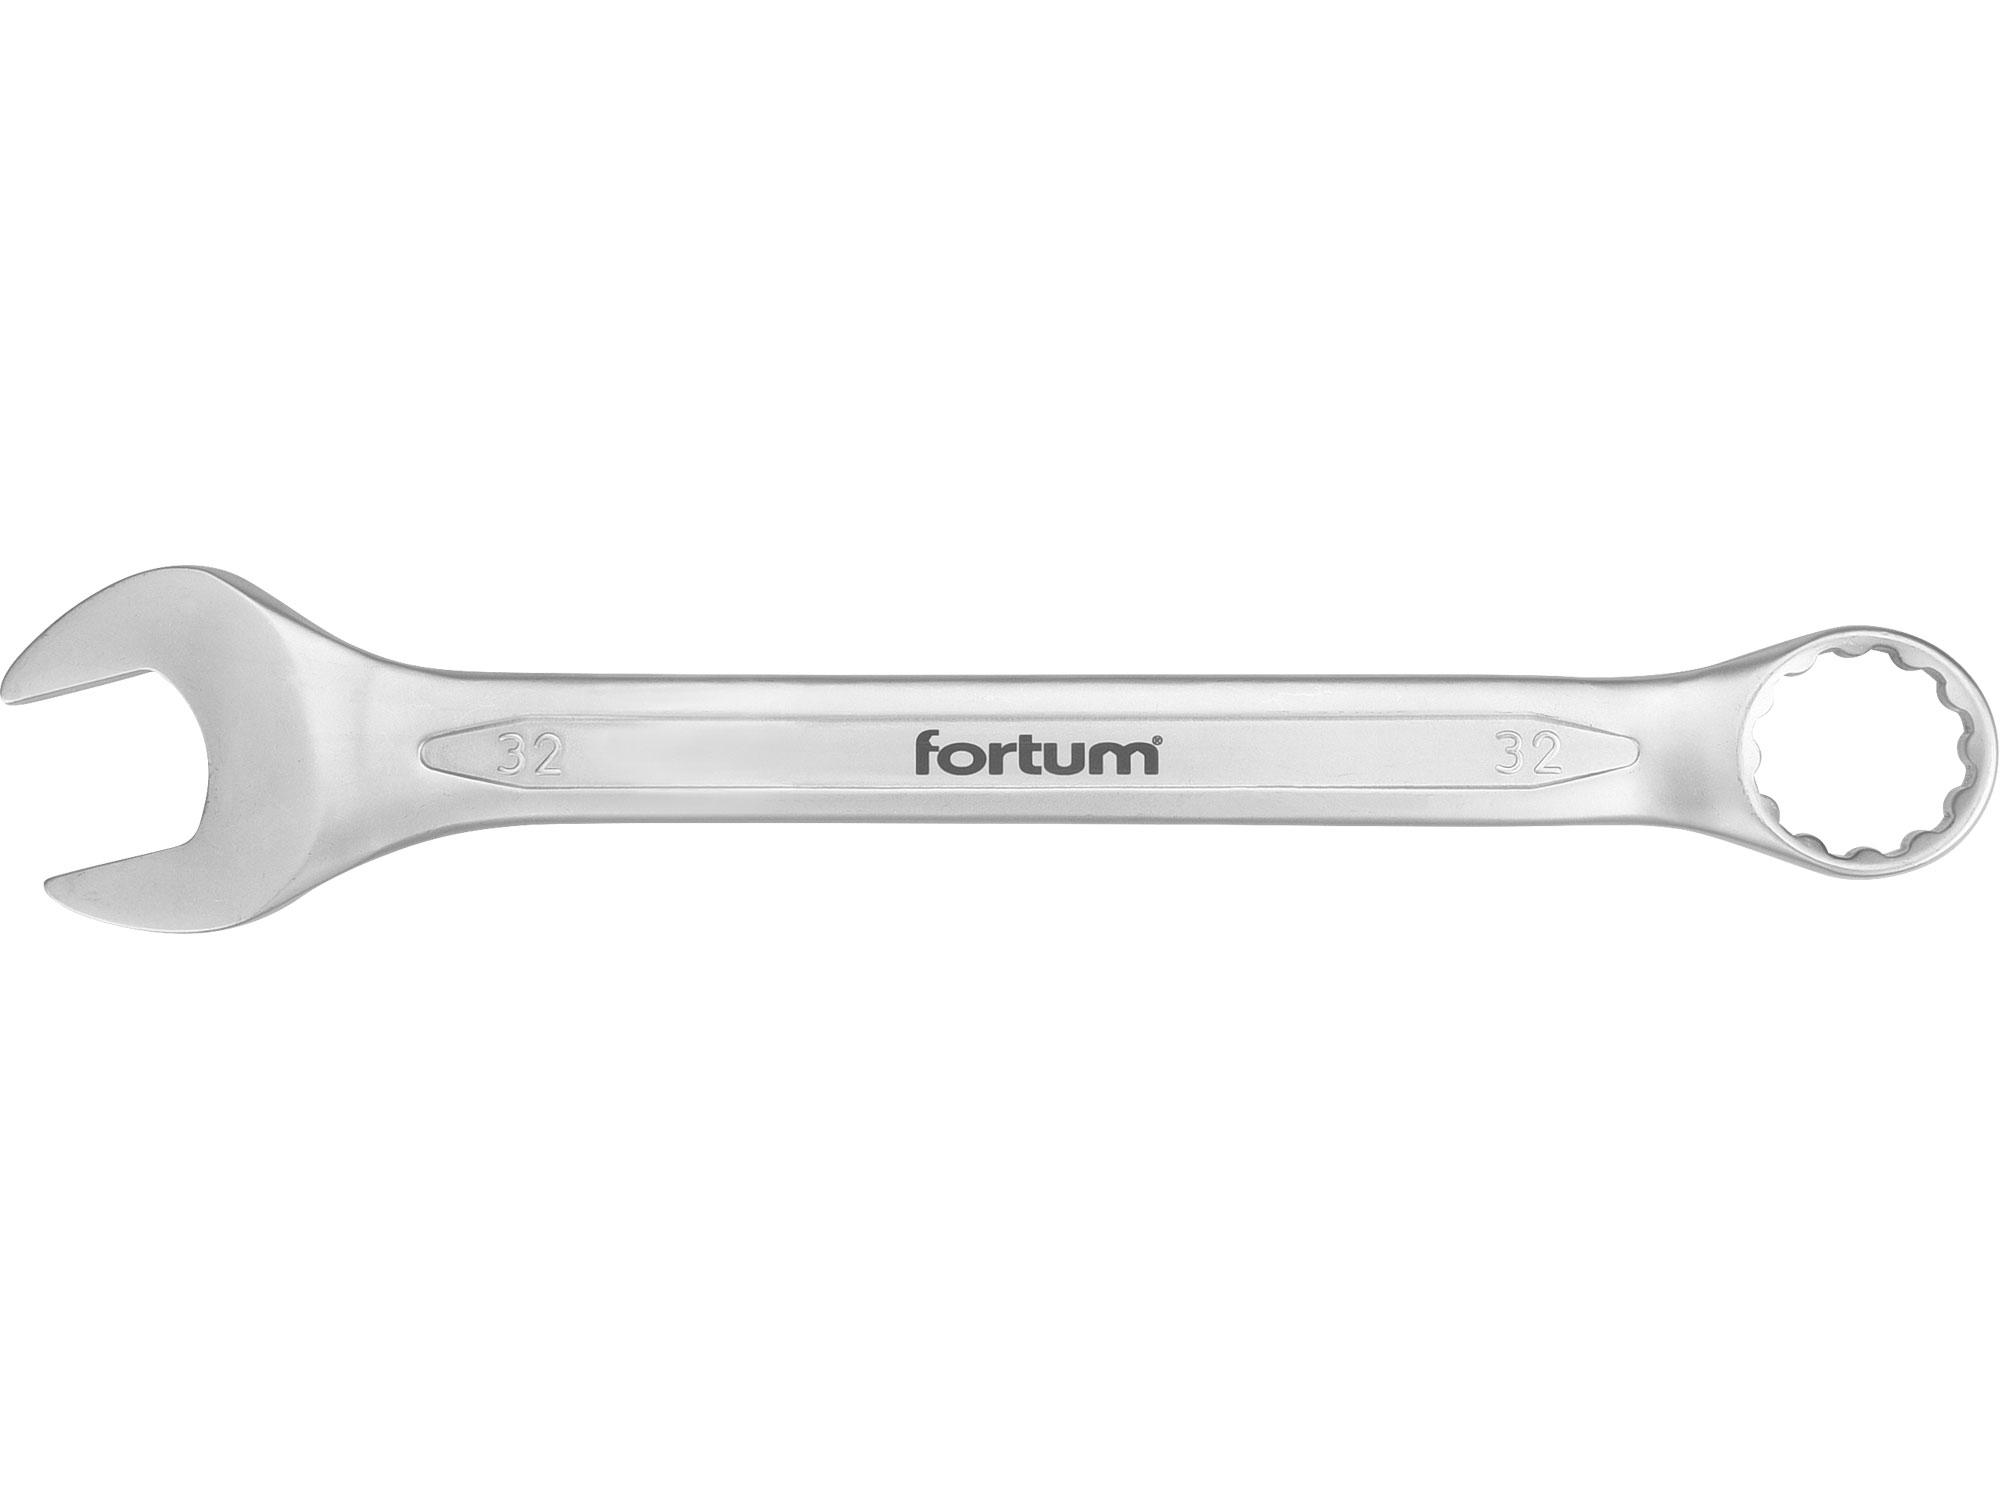 klíč očkoplochý, 32mm, L 372mm, FORTUM 4730232